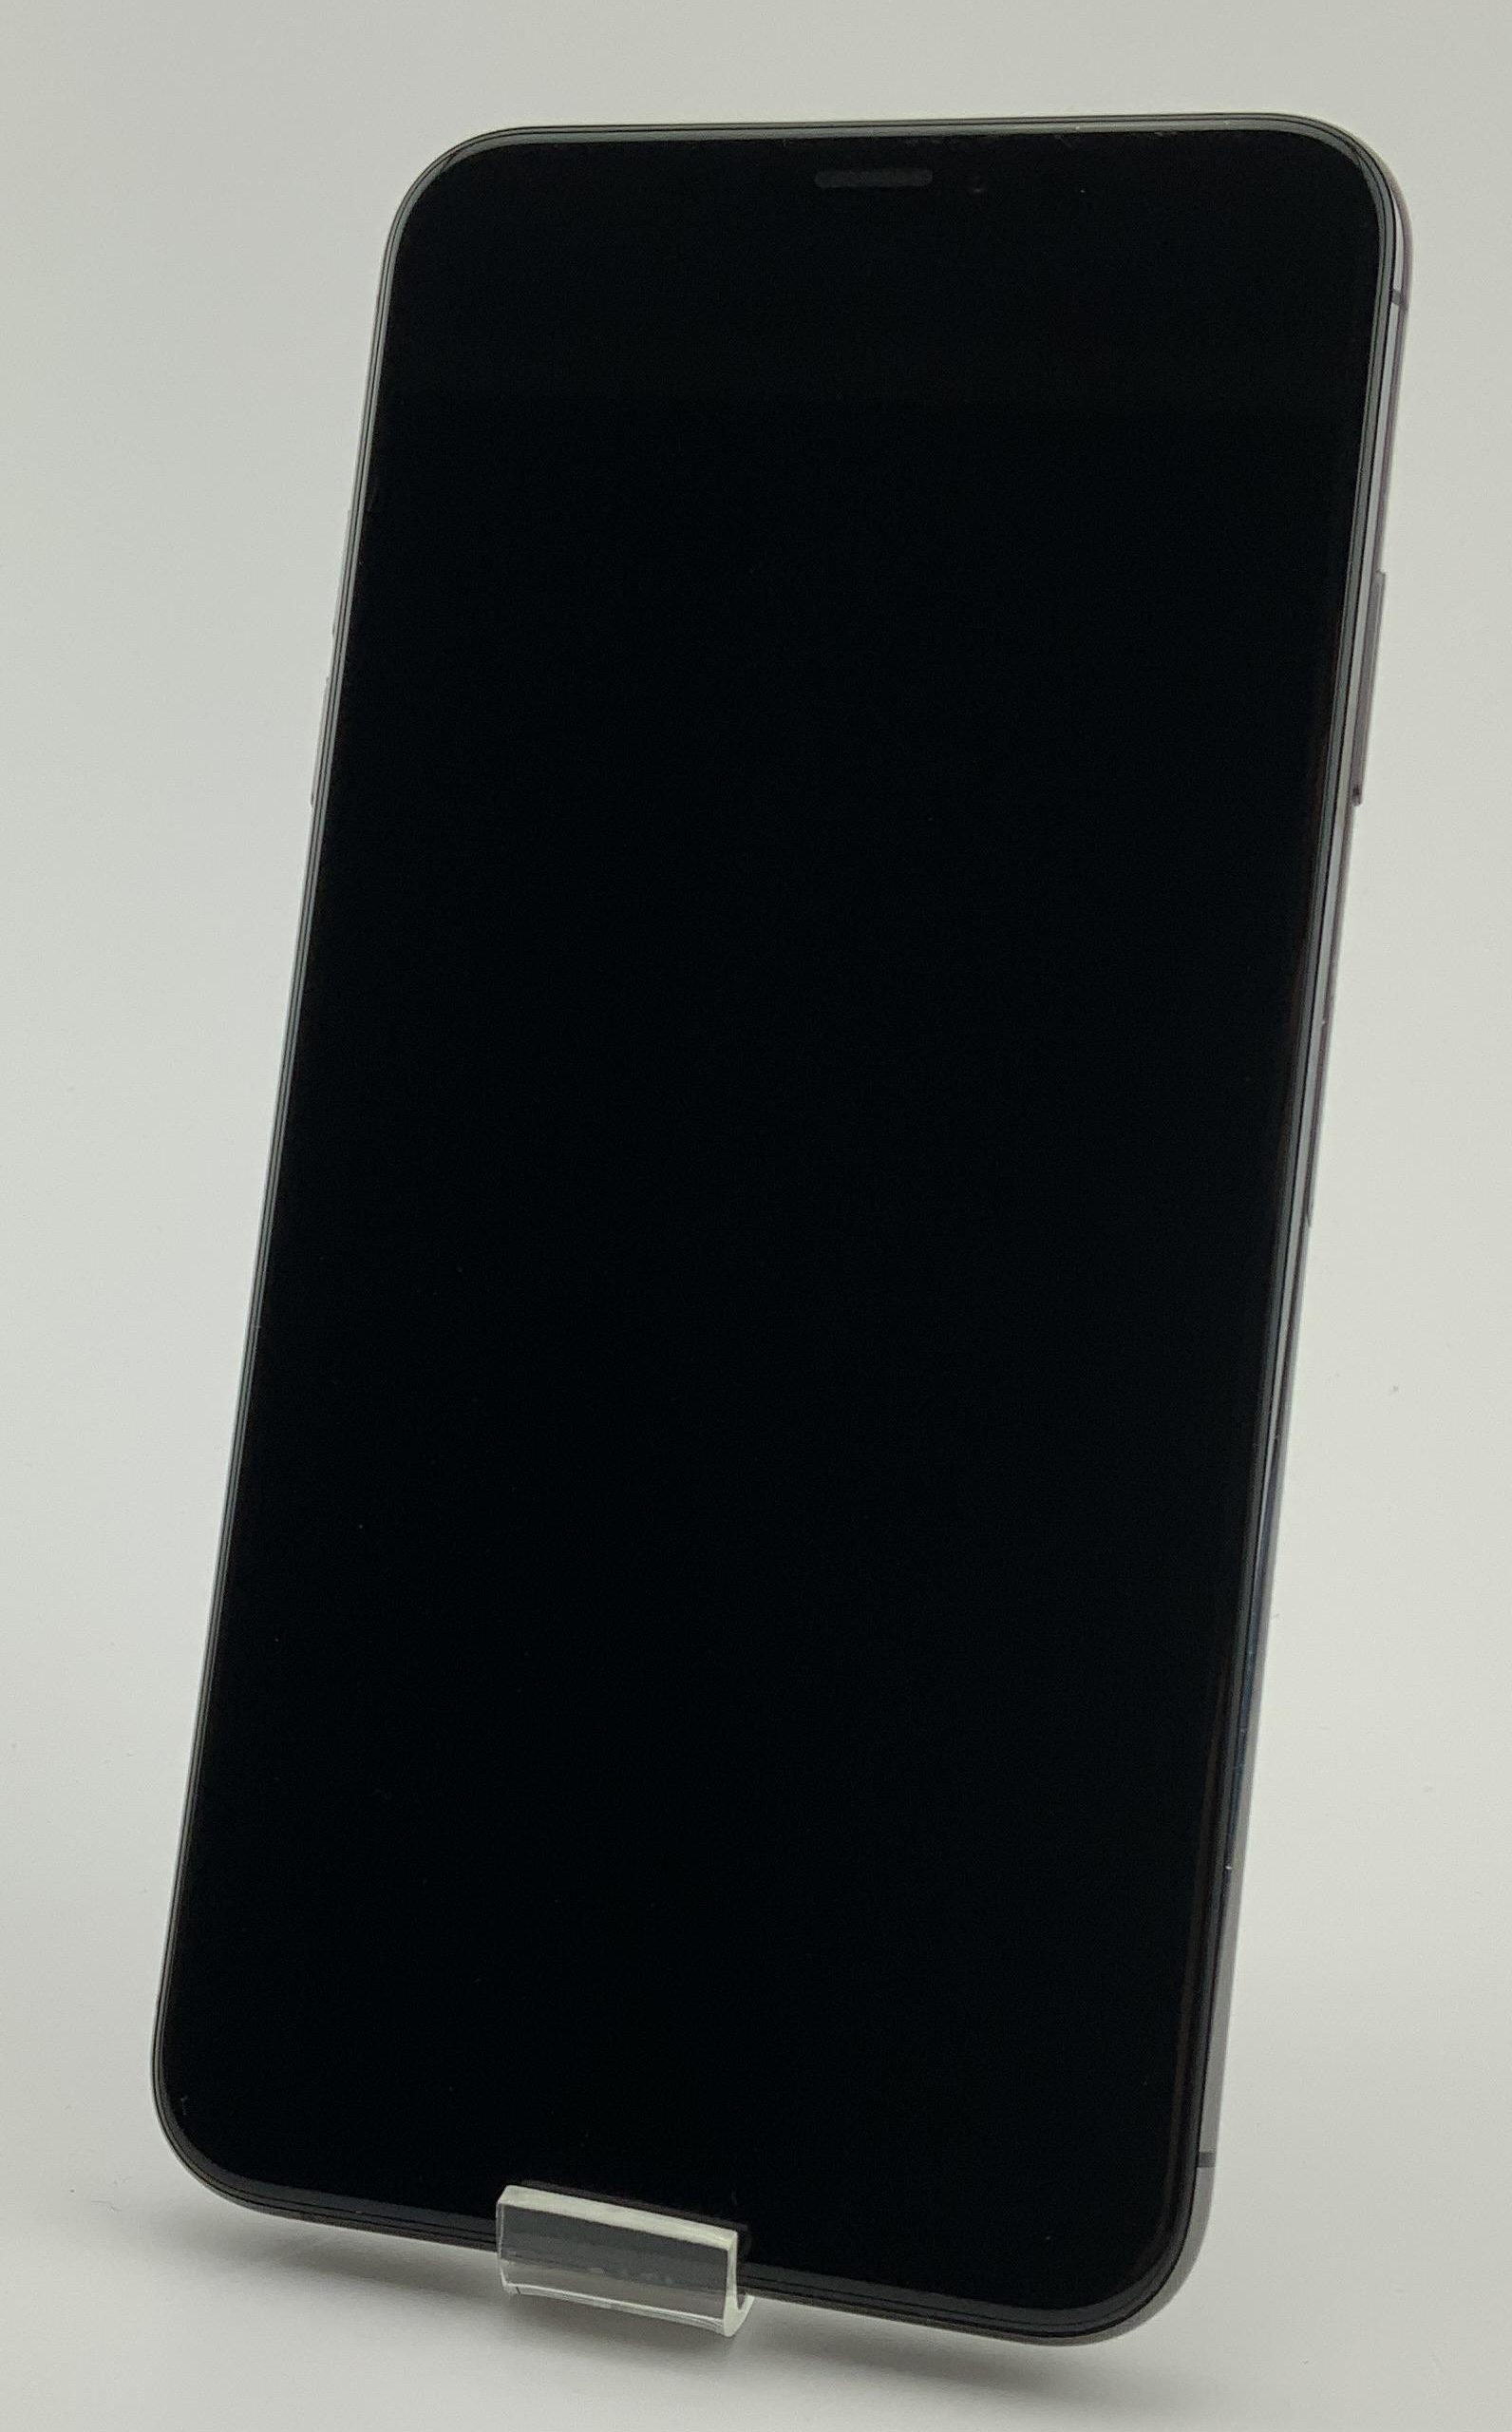 iPhone XS Max 64GB, 64GB, Space Gray, Bild 1